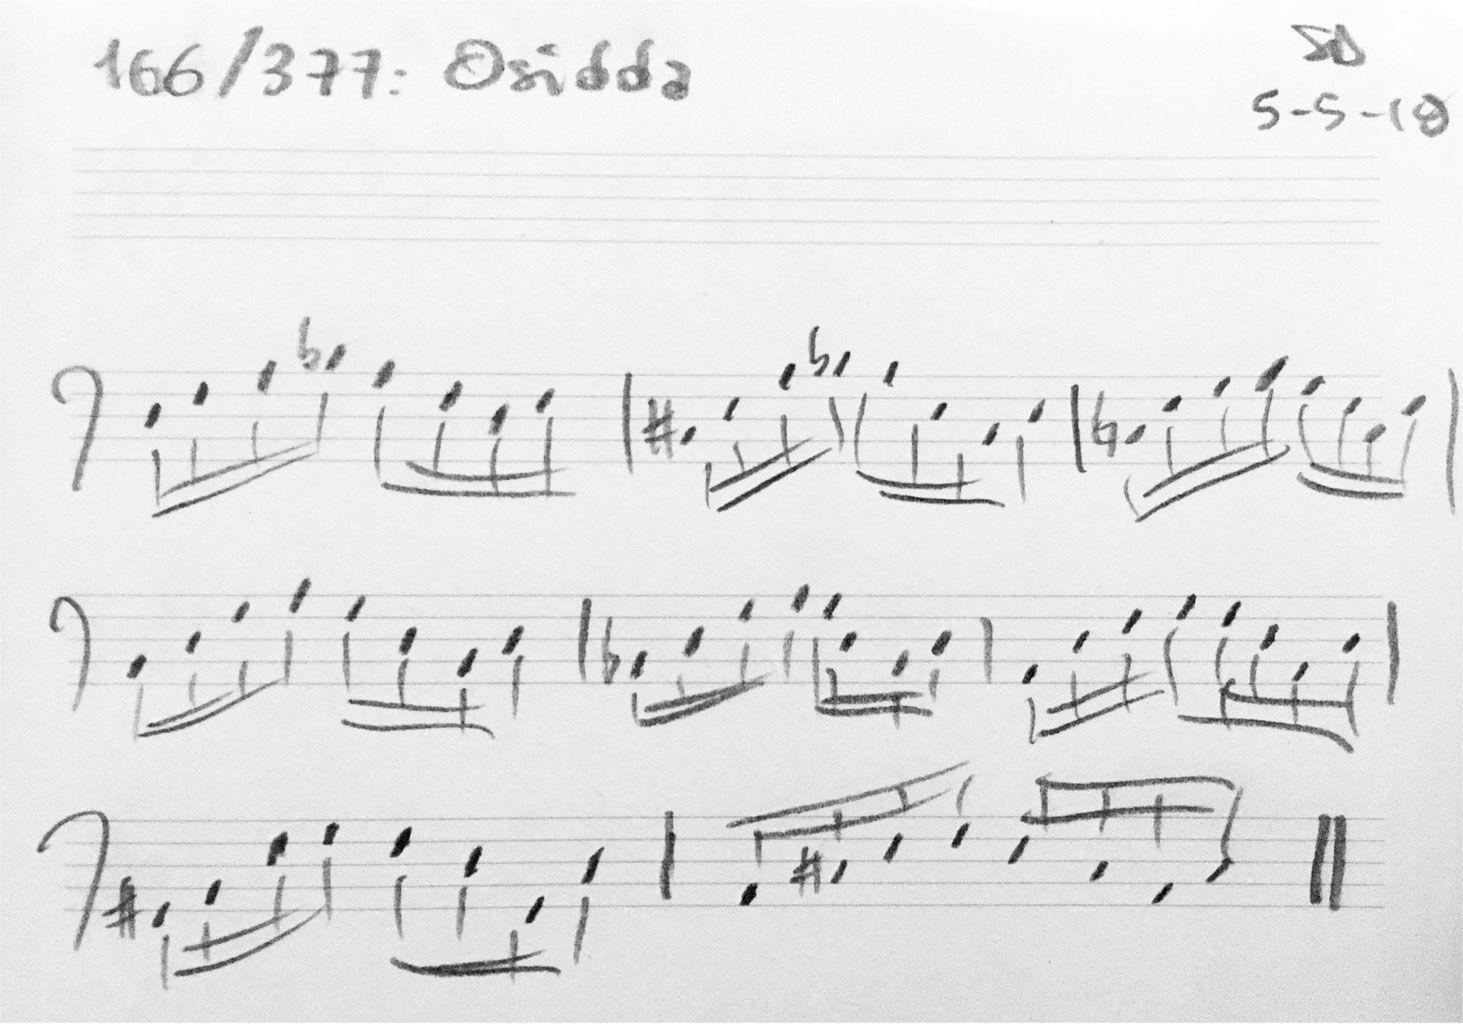 166-Osidda-score